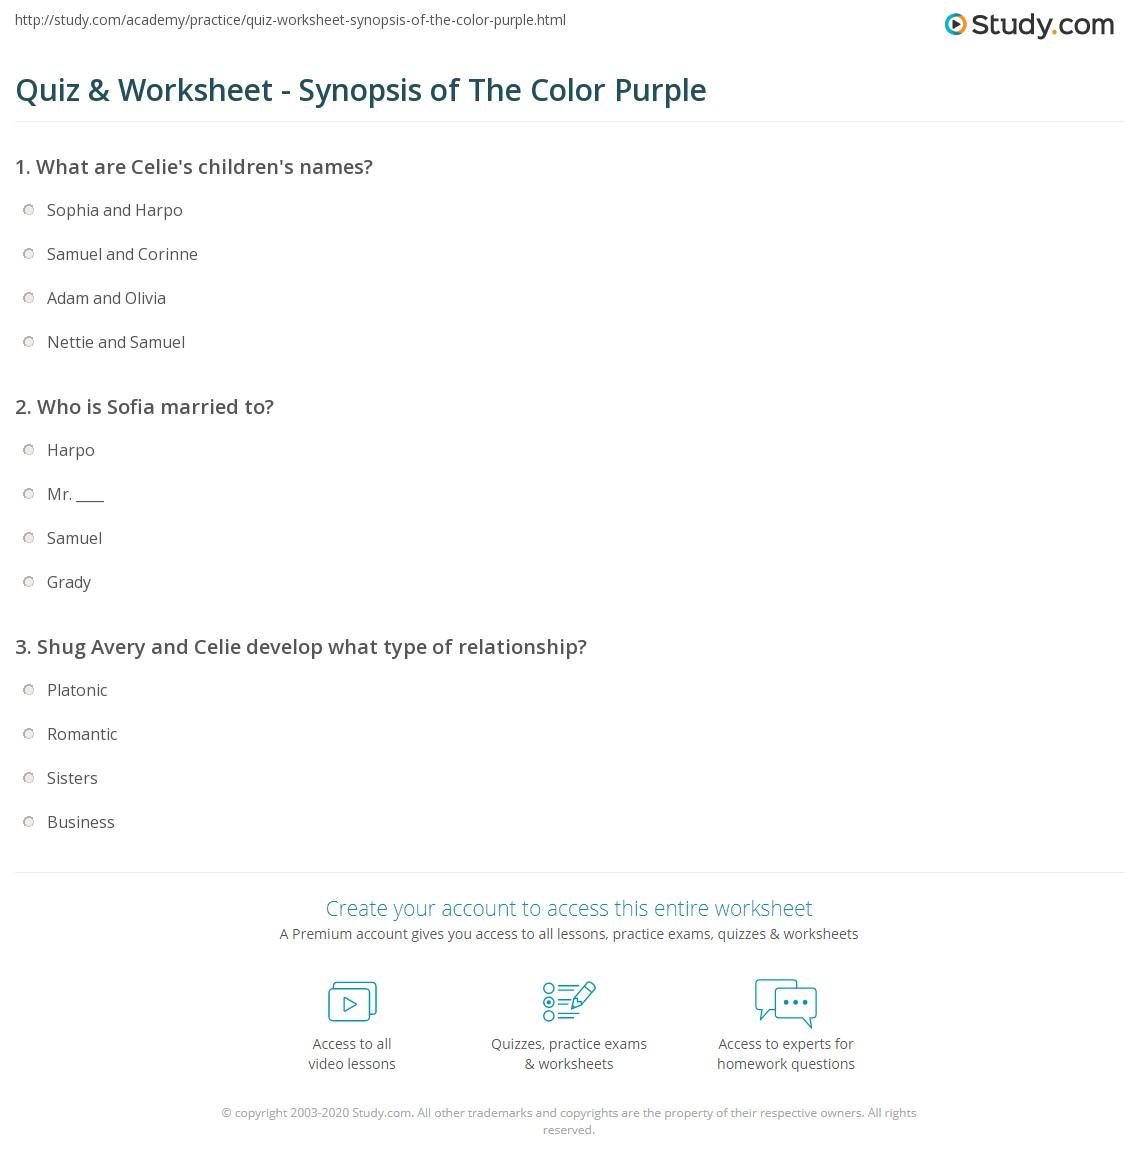 The color purple book review essay